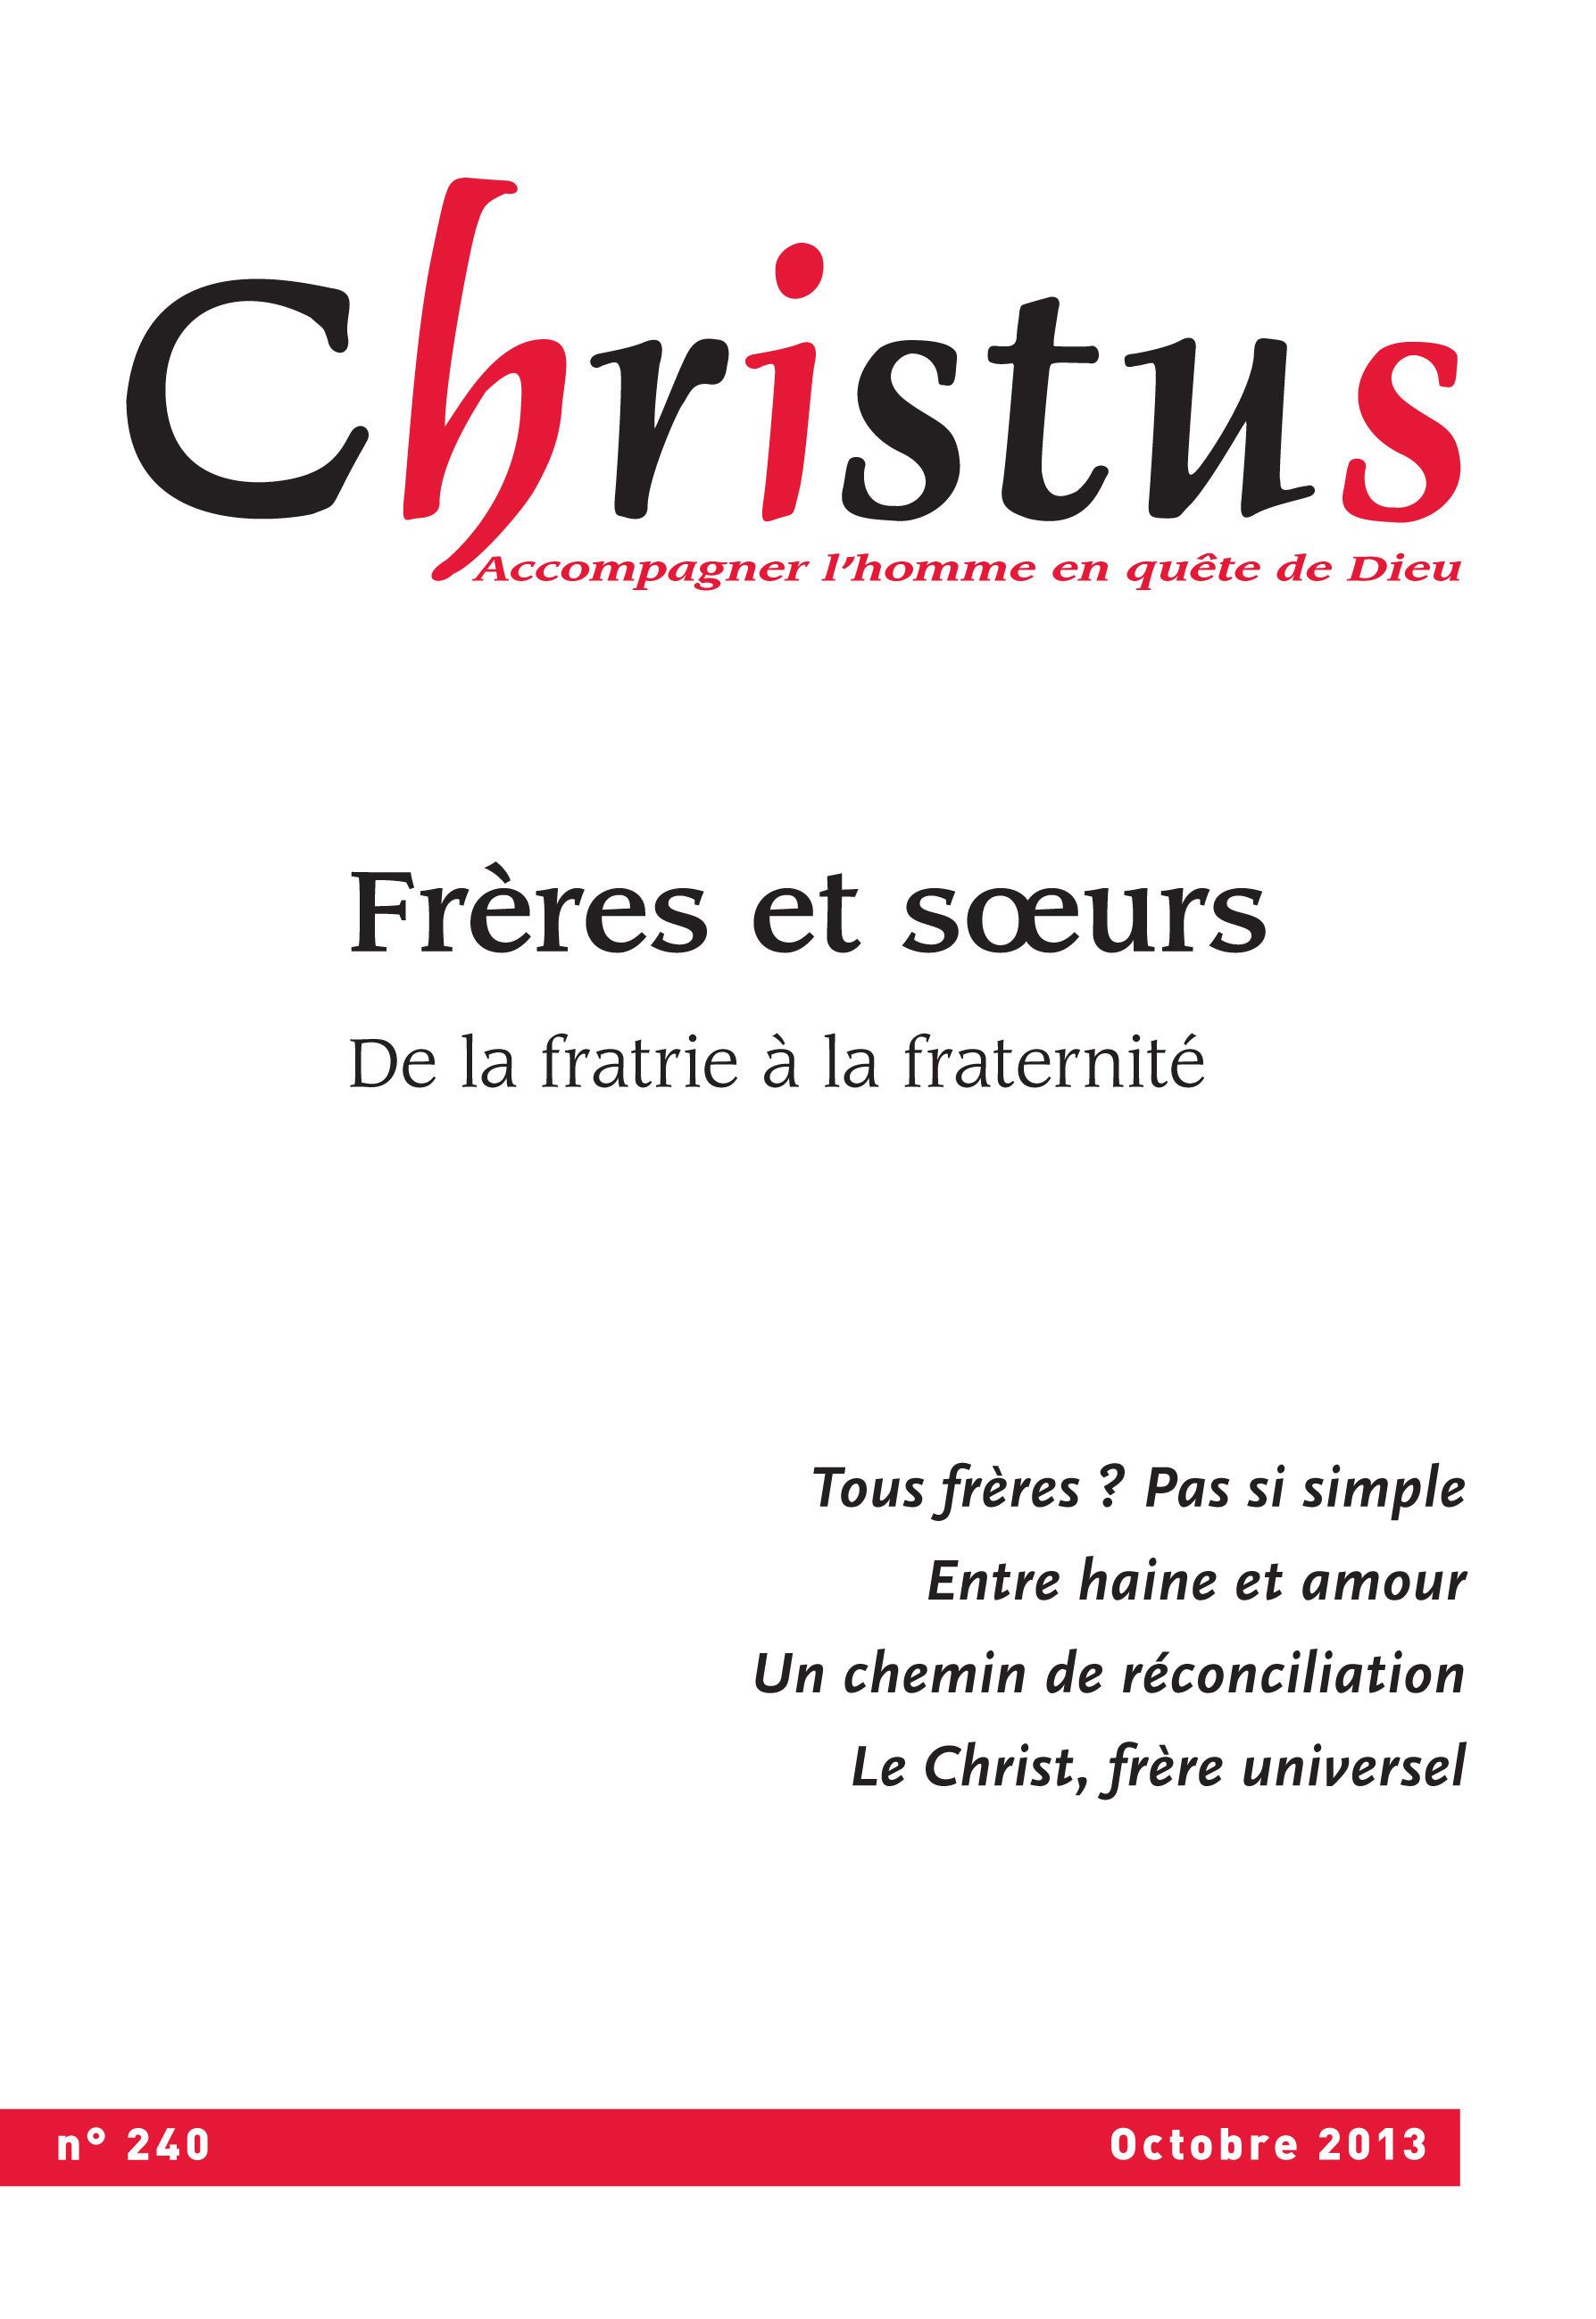 Christus Octobre 2013 - N°240